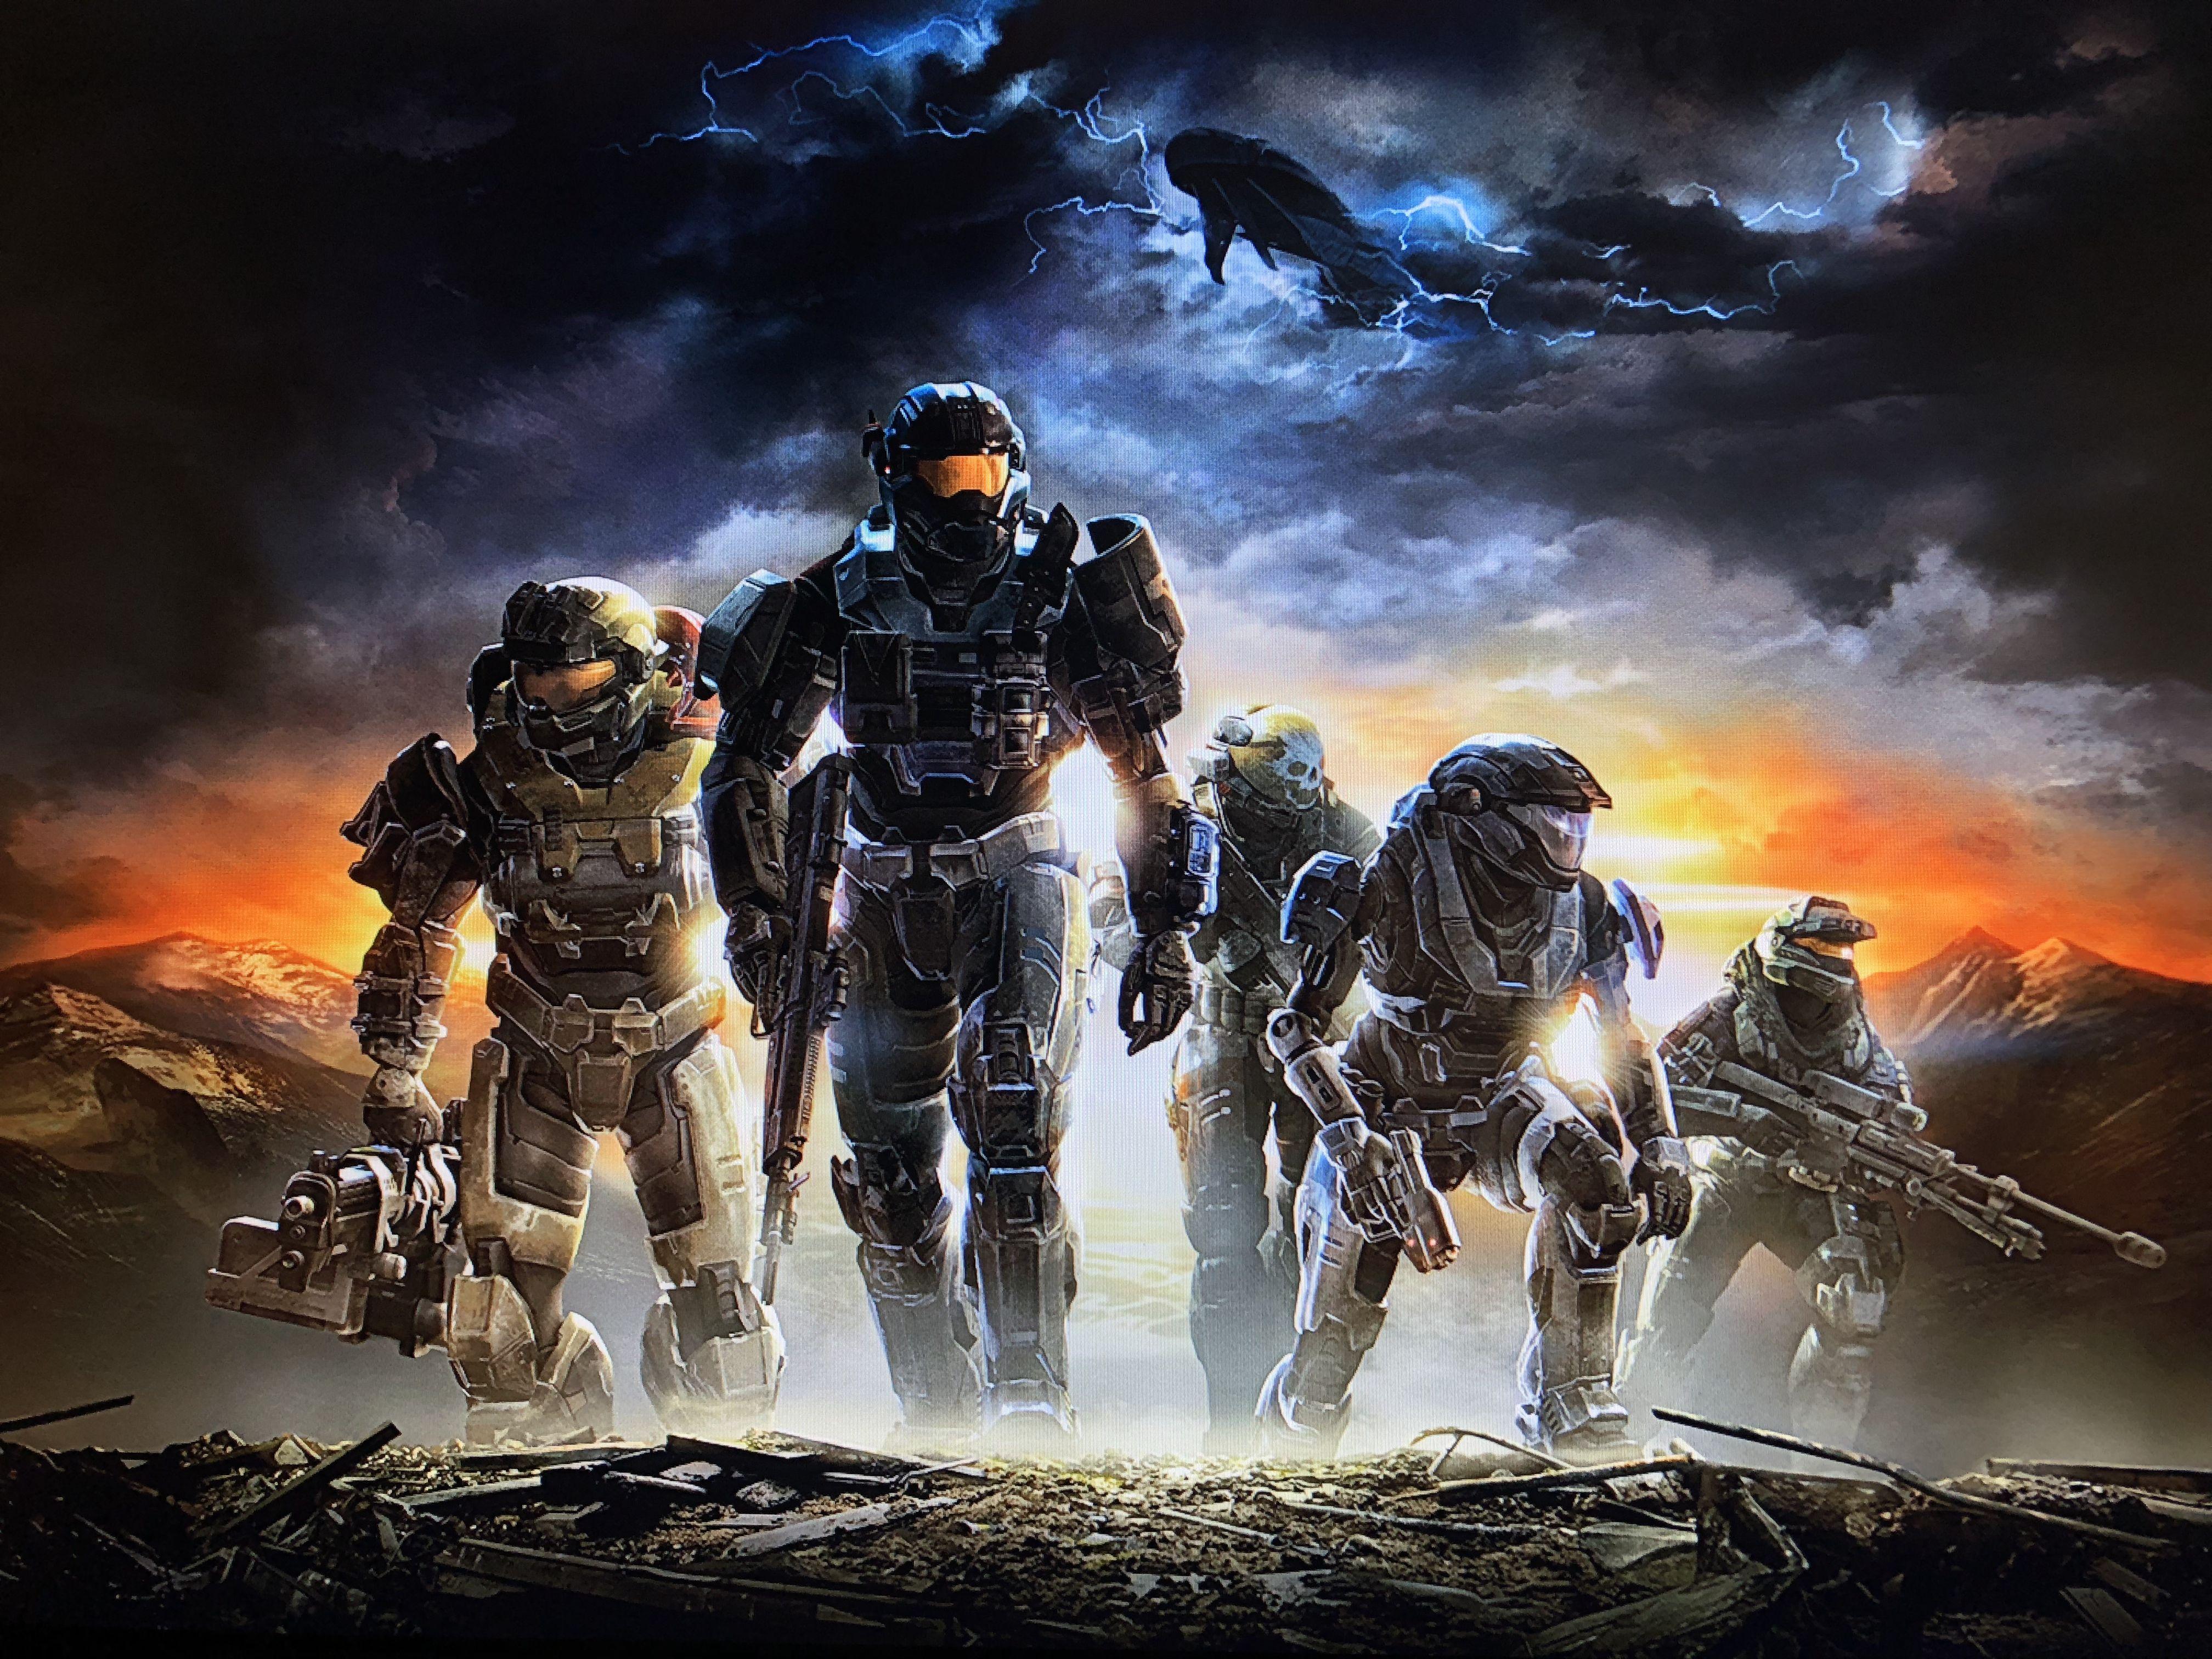 Halo Reach Noble Team Halo reach, Halo game, Master chief